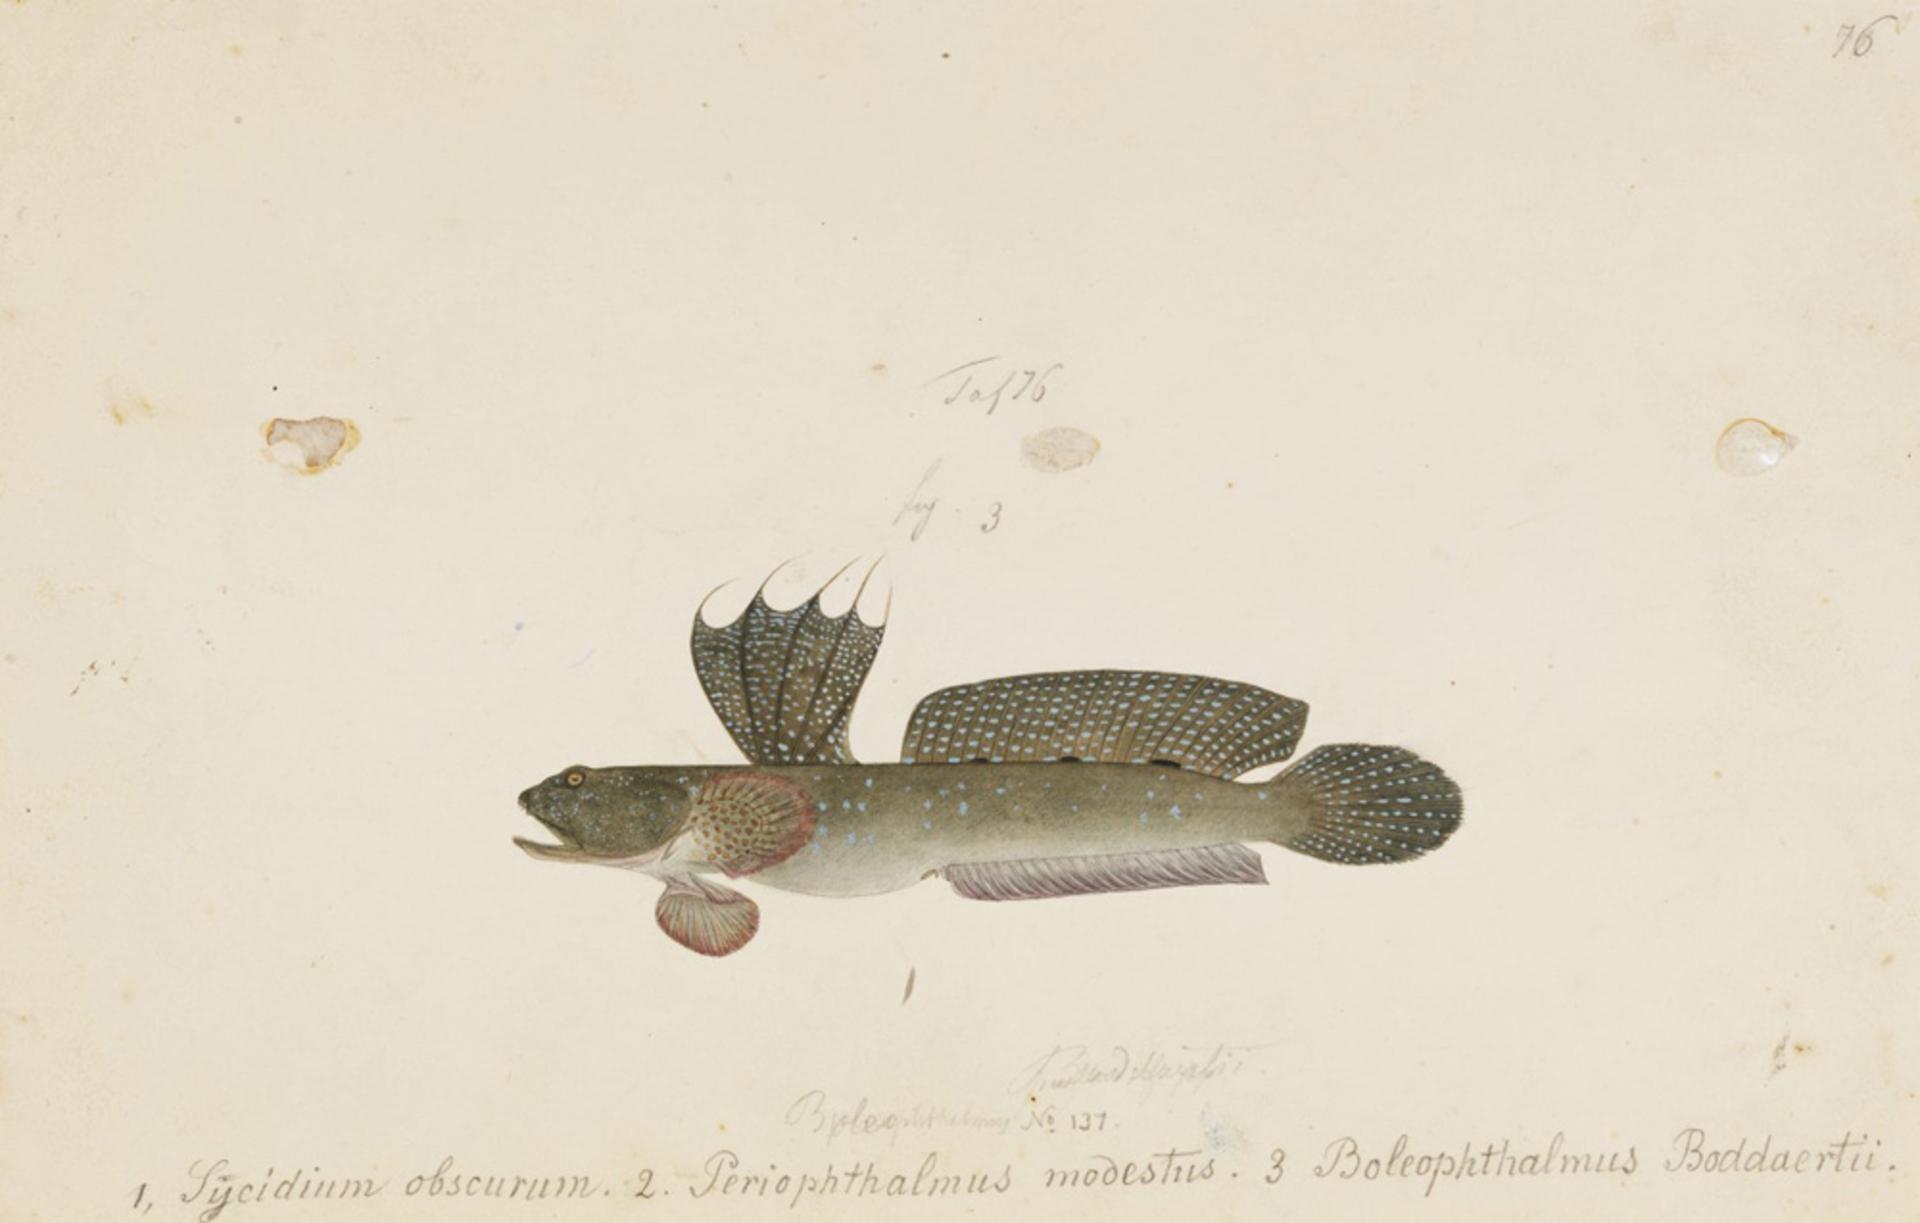 RMNH.ART.793 | Boleophthalmus pectinirostris